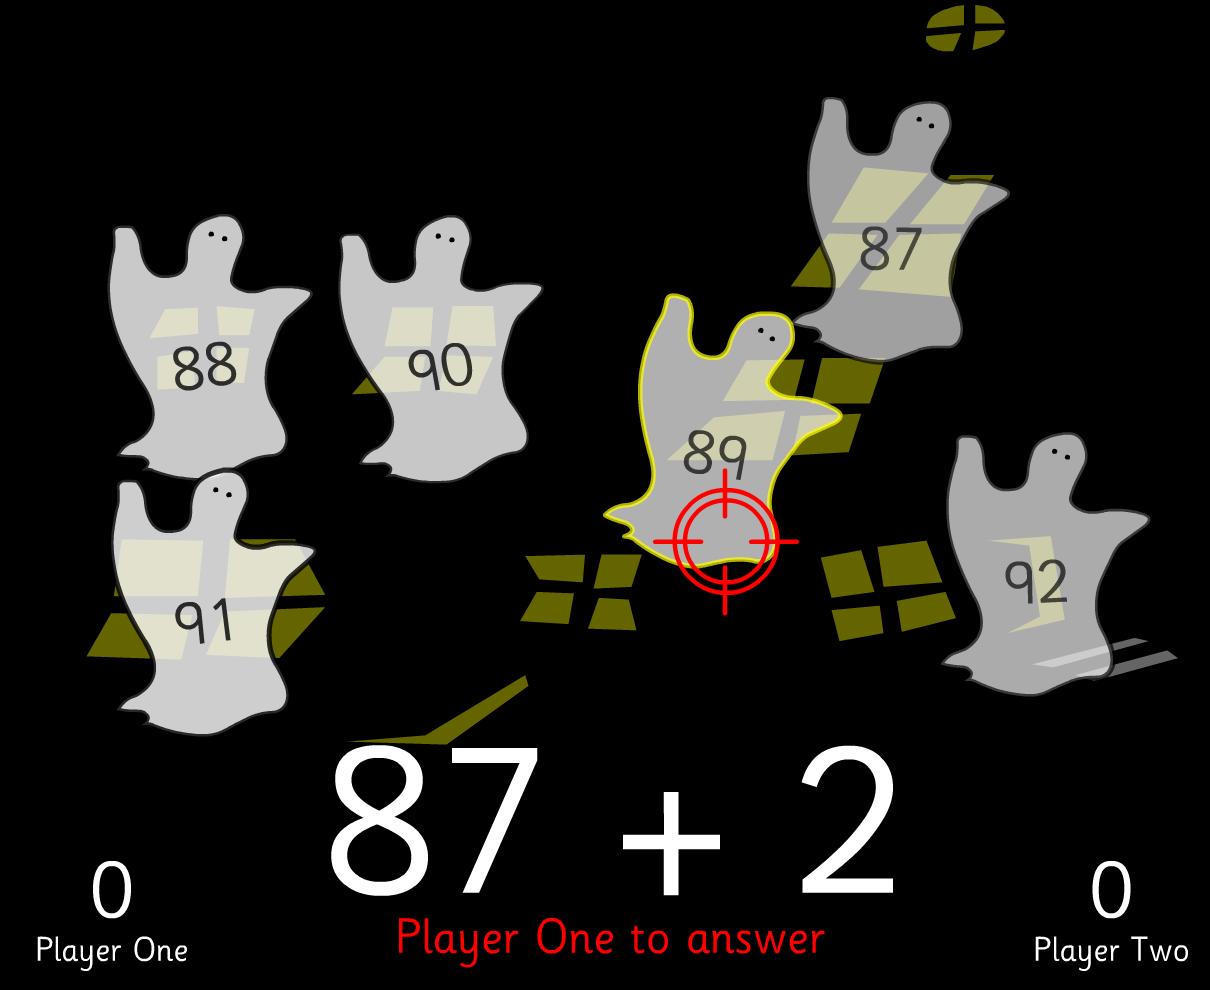 http://www.oswego.org/ocsd-web/games/Ghostblasters3/ghostadd2.html